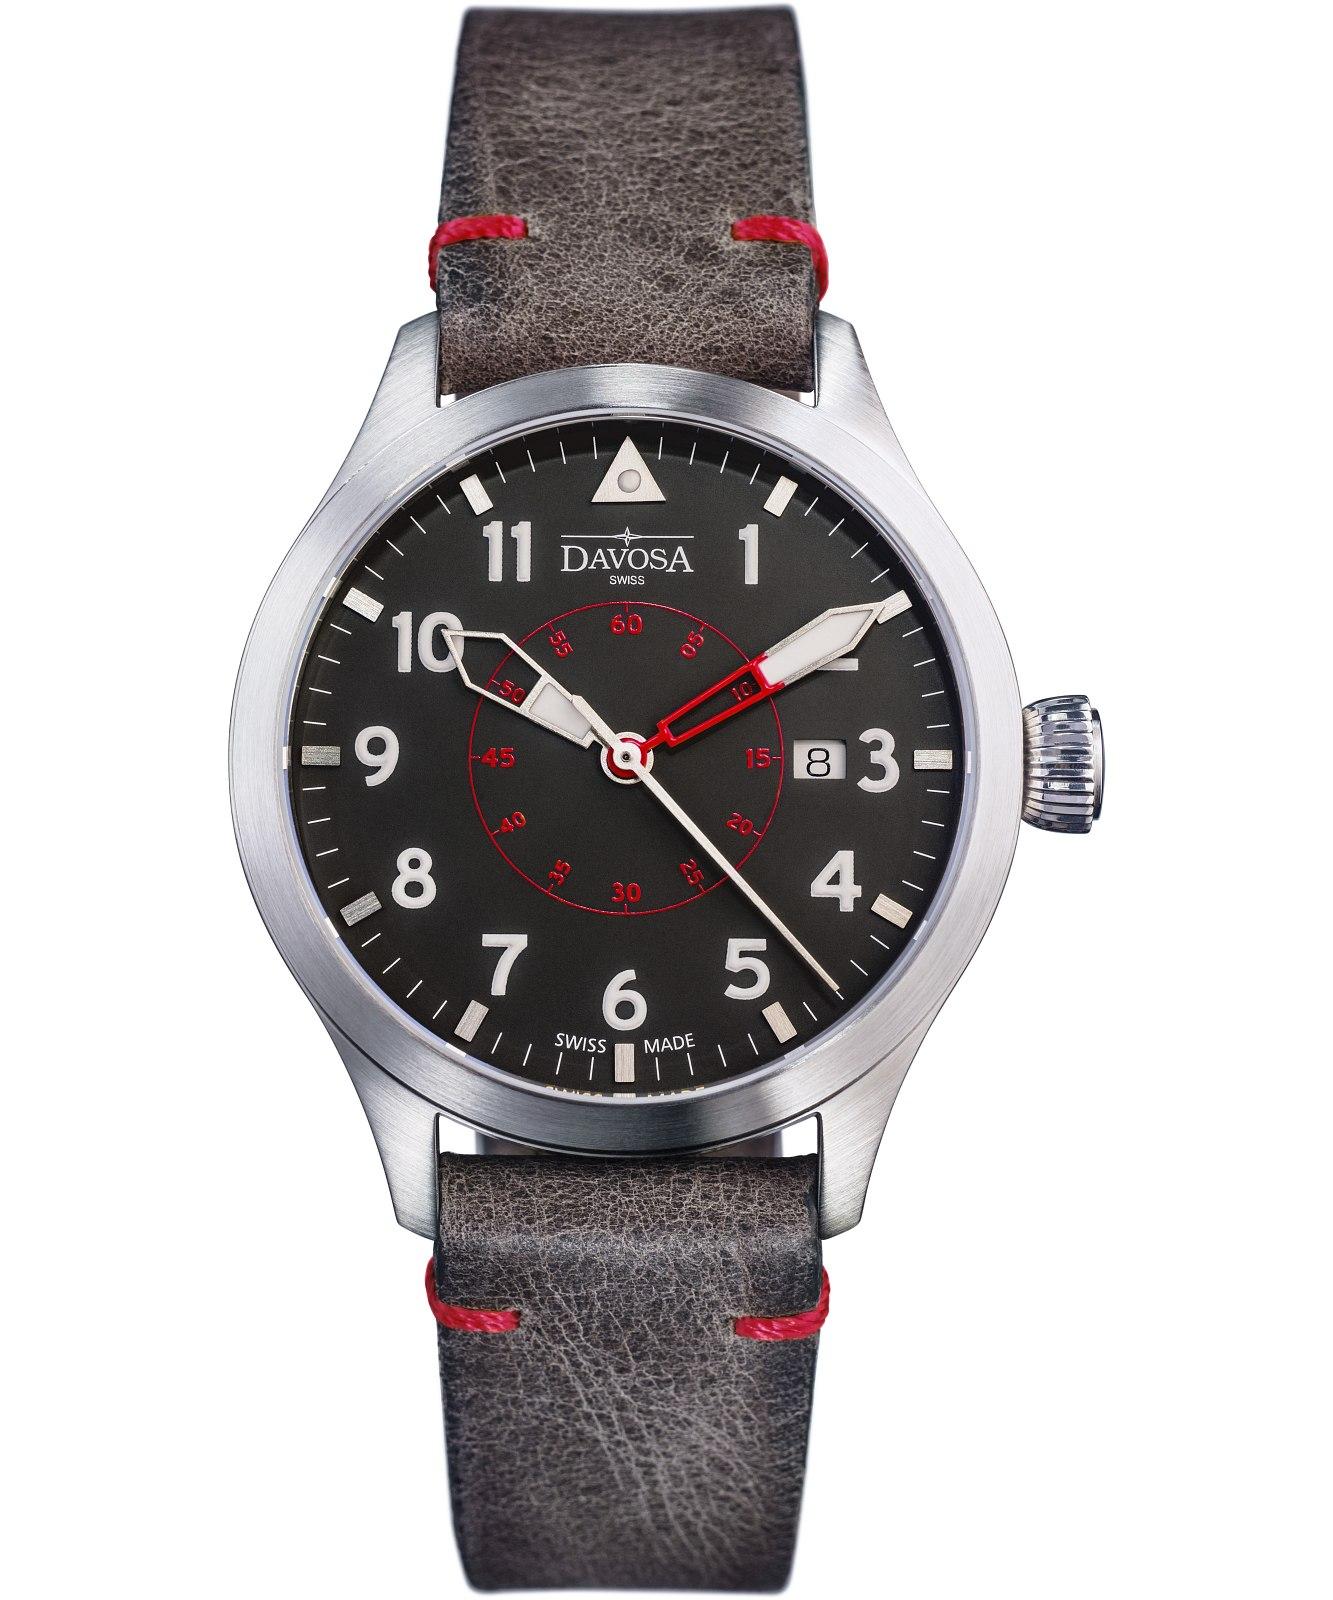 zegarek-meski-davosa-ternos-professional-automatic-161-559-40